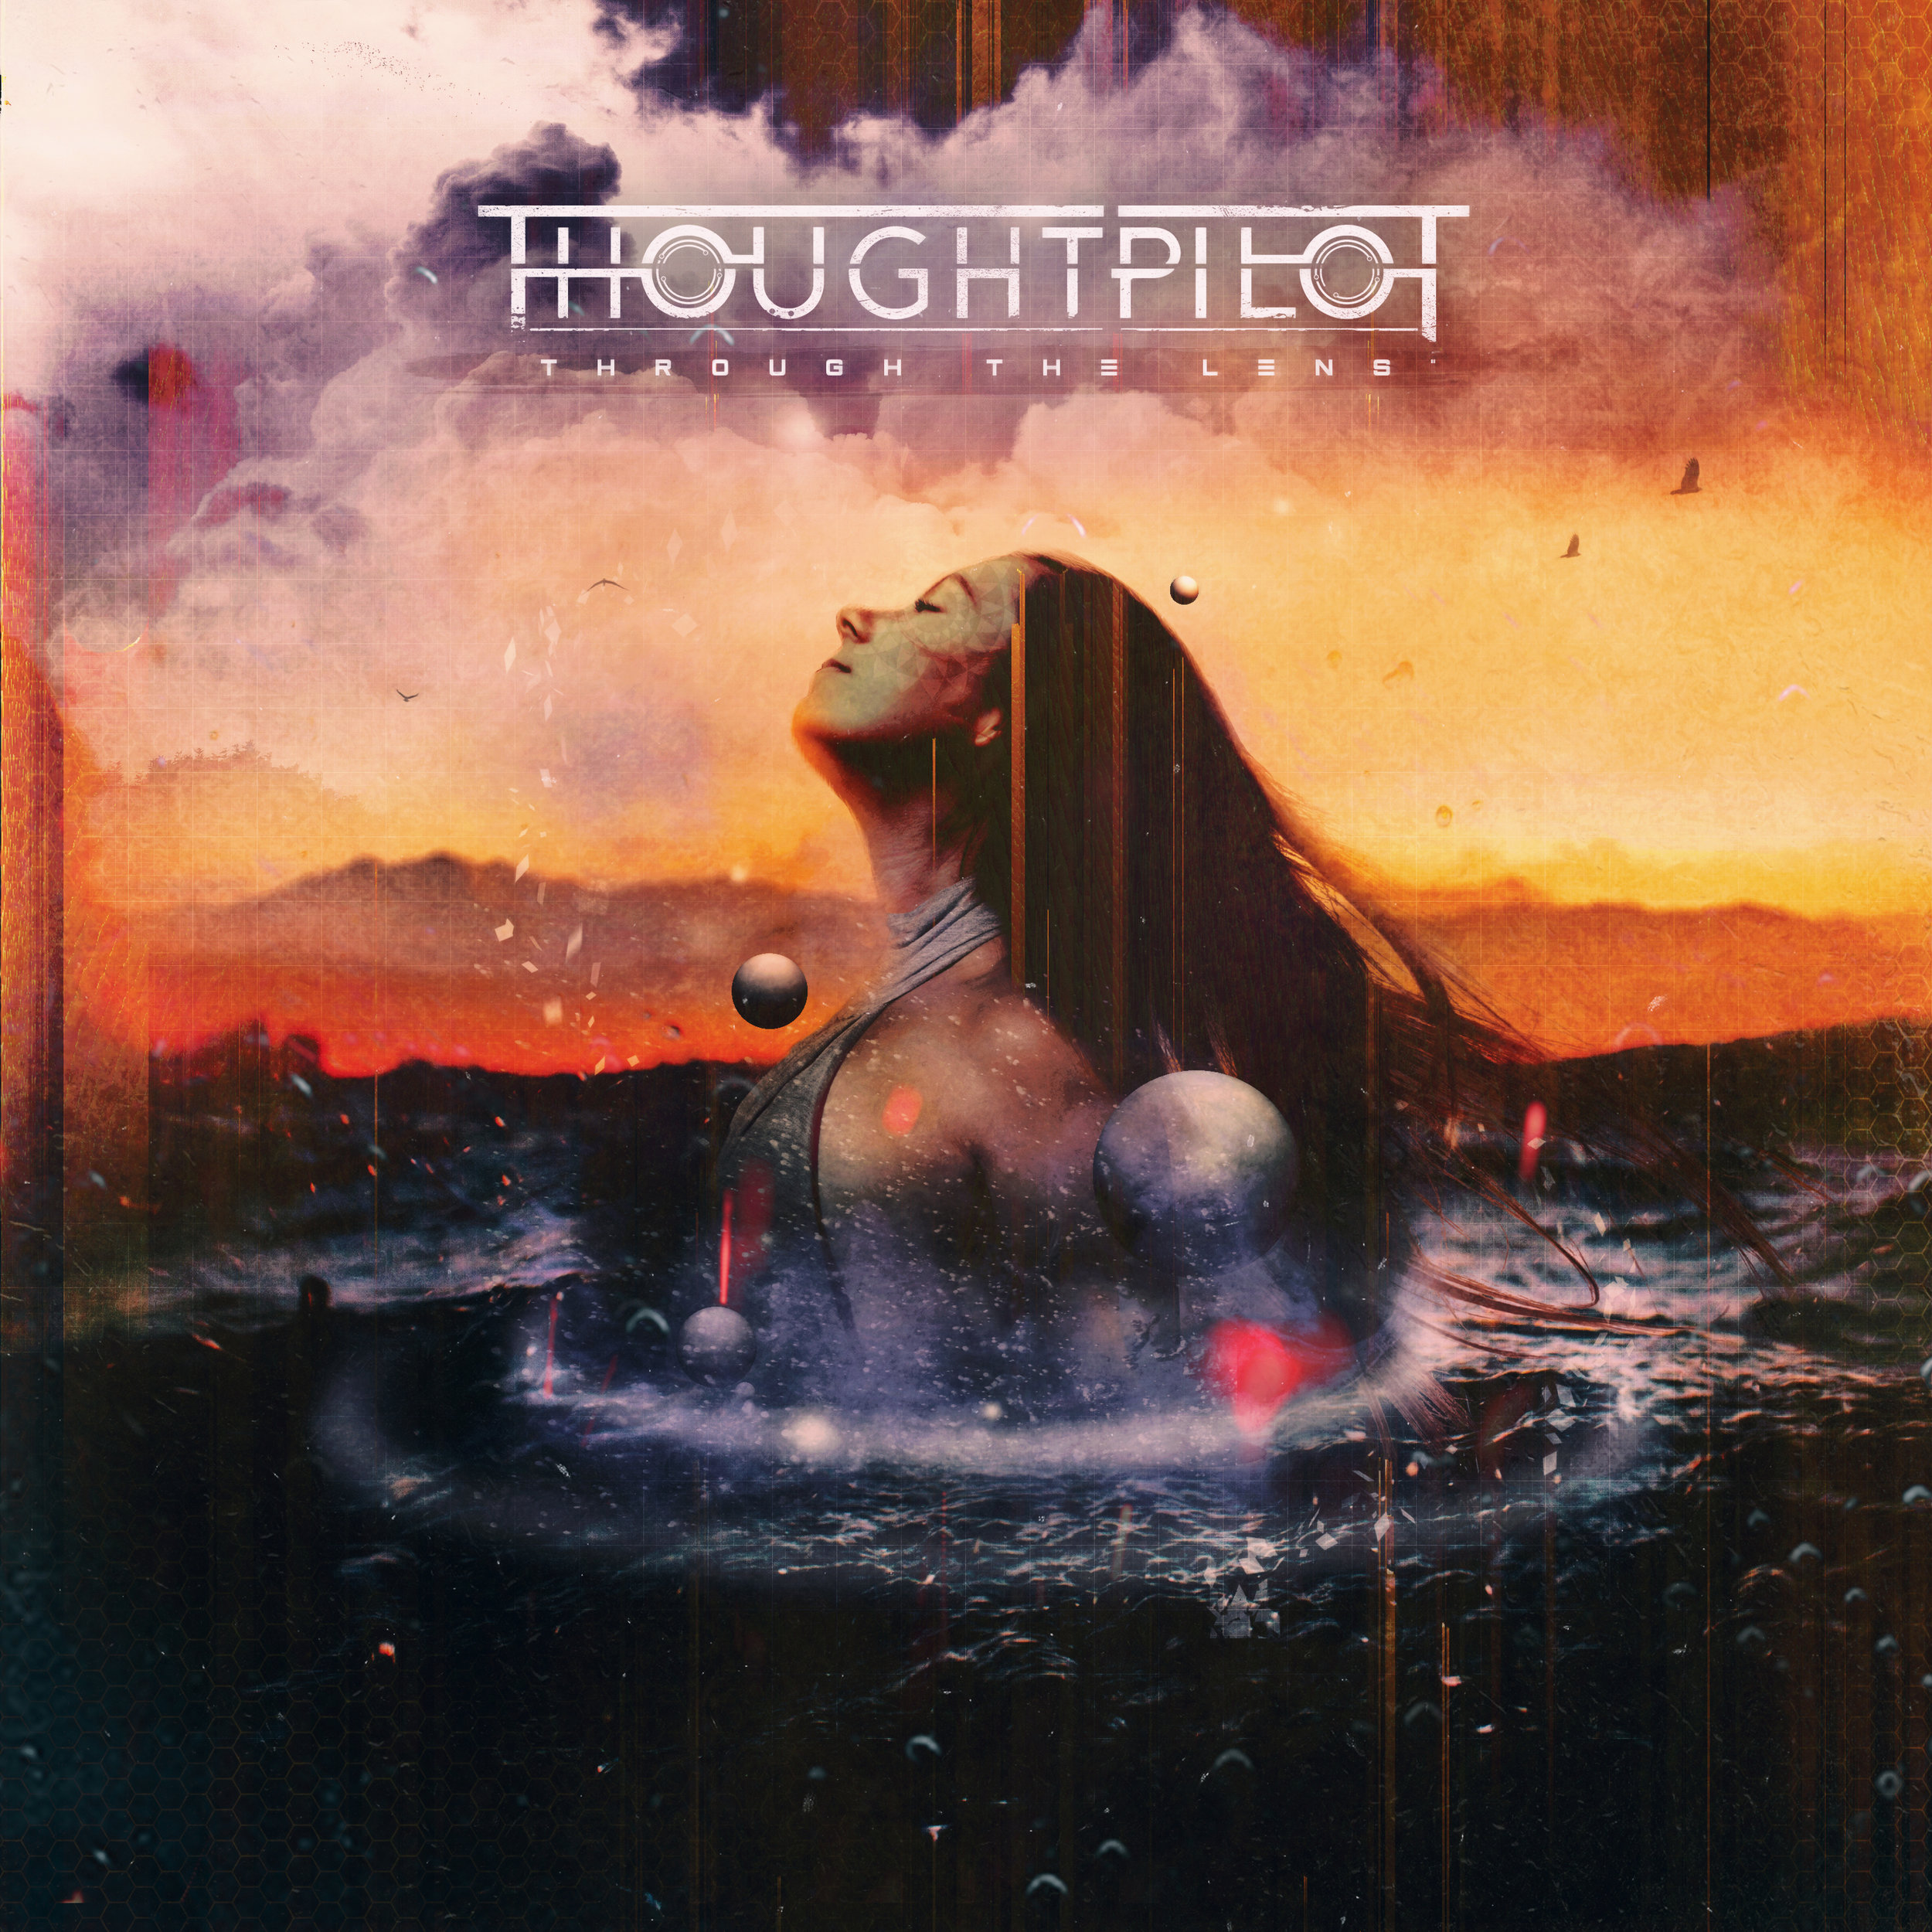 Thoughtpilot_Through The Lens_Final Album Art copy.jpg